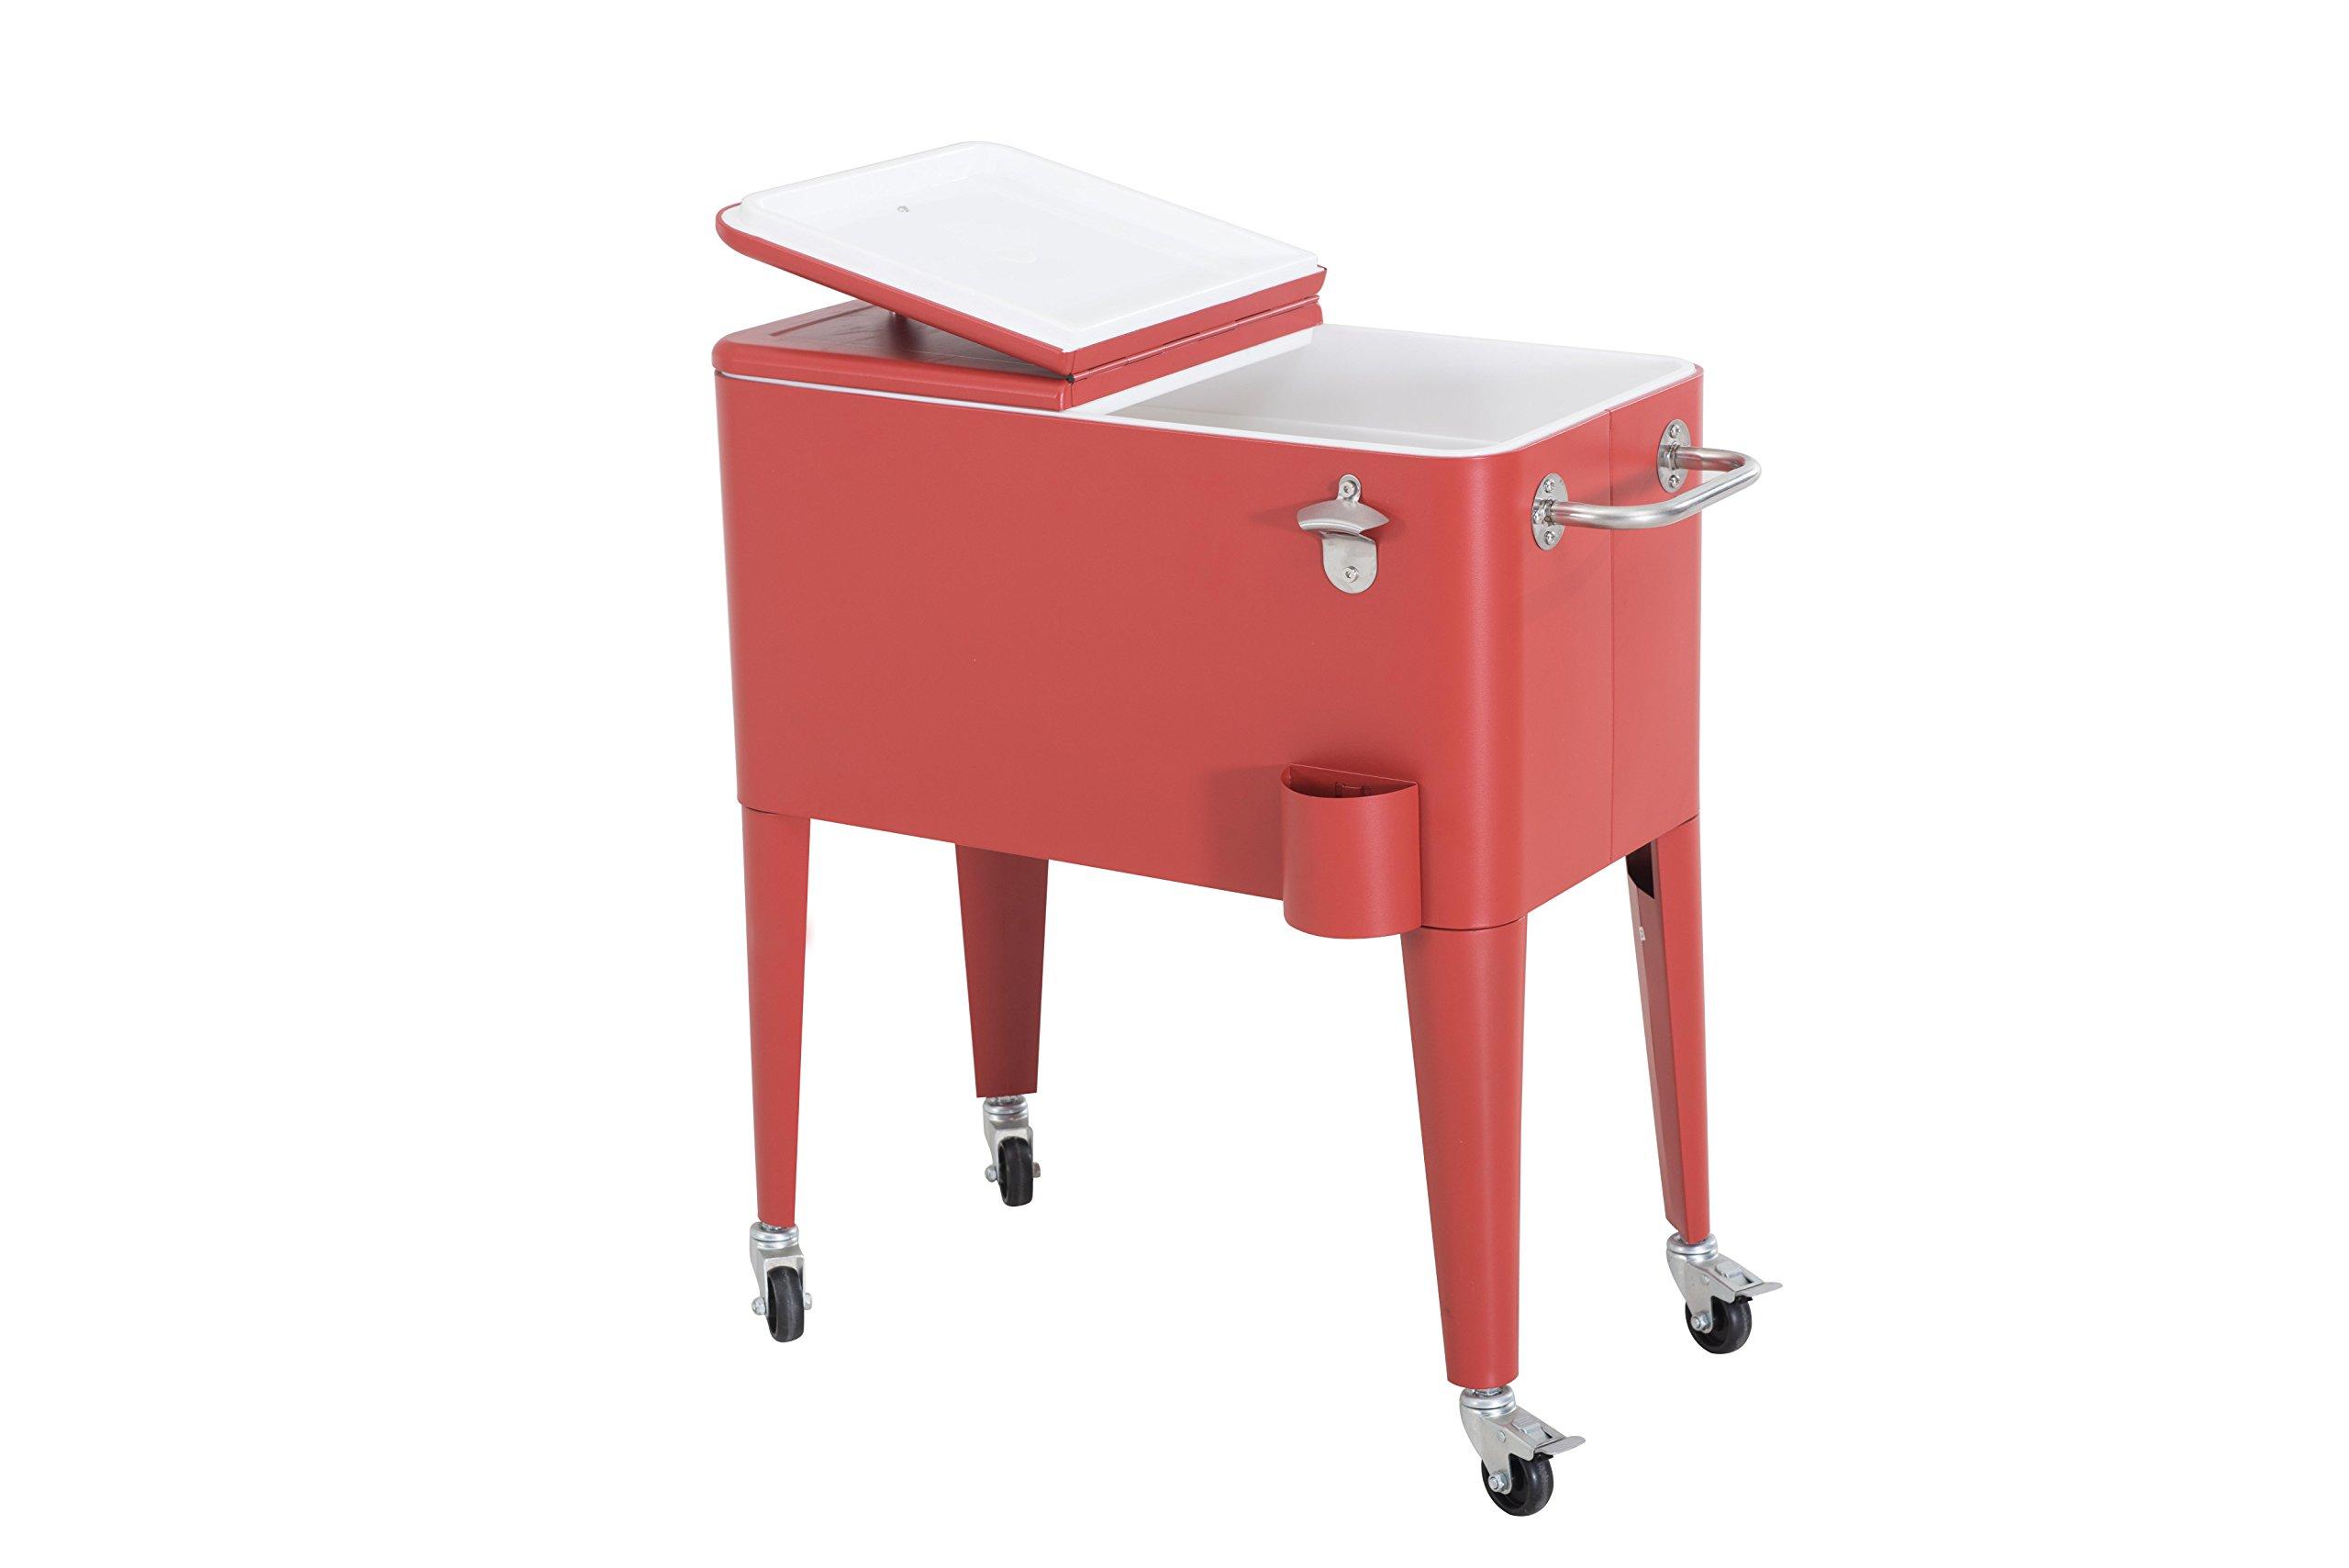 Sunjoy L-BC153PST 60 quart Wheeled Beverage Cooler in Red by sunjoy (Image #2)